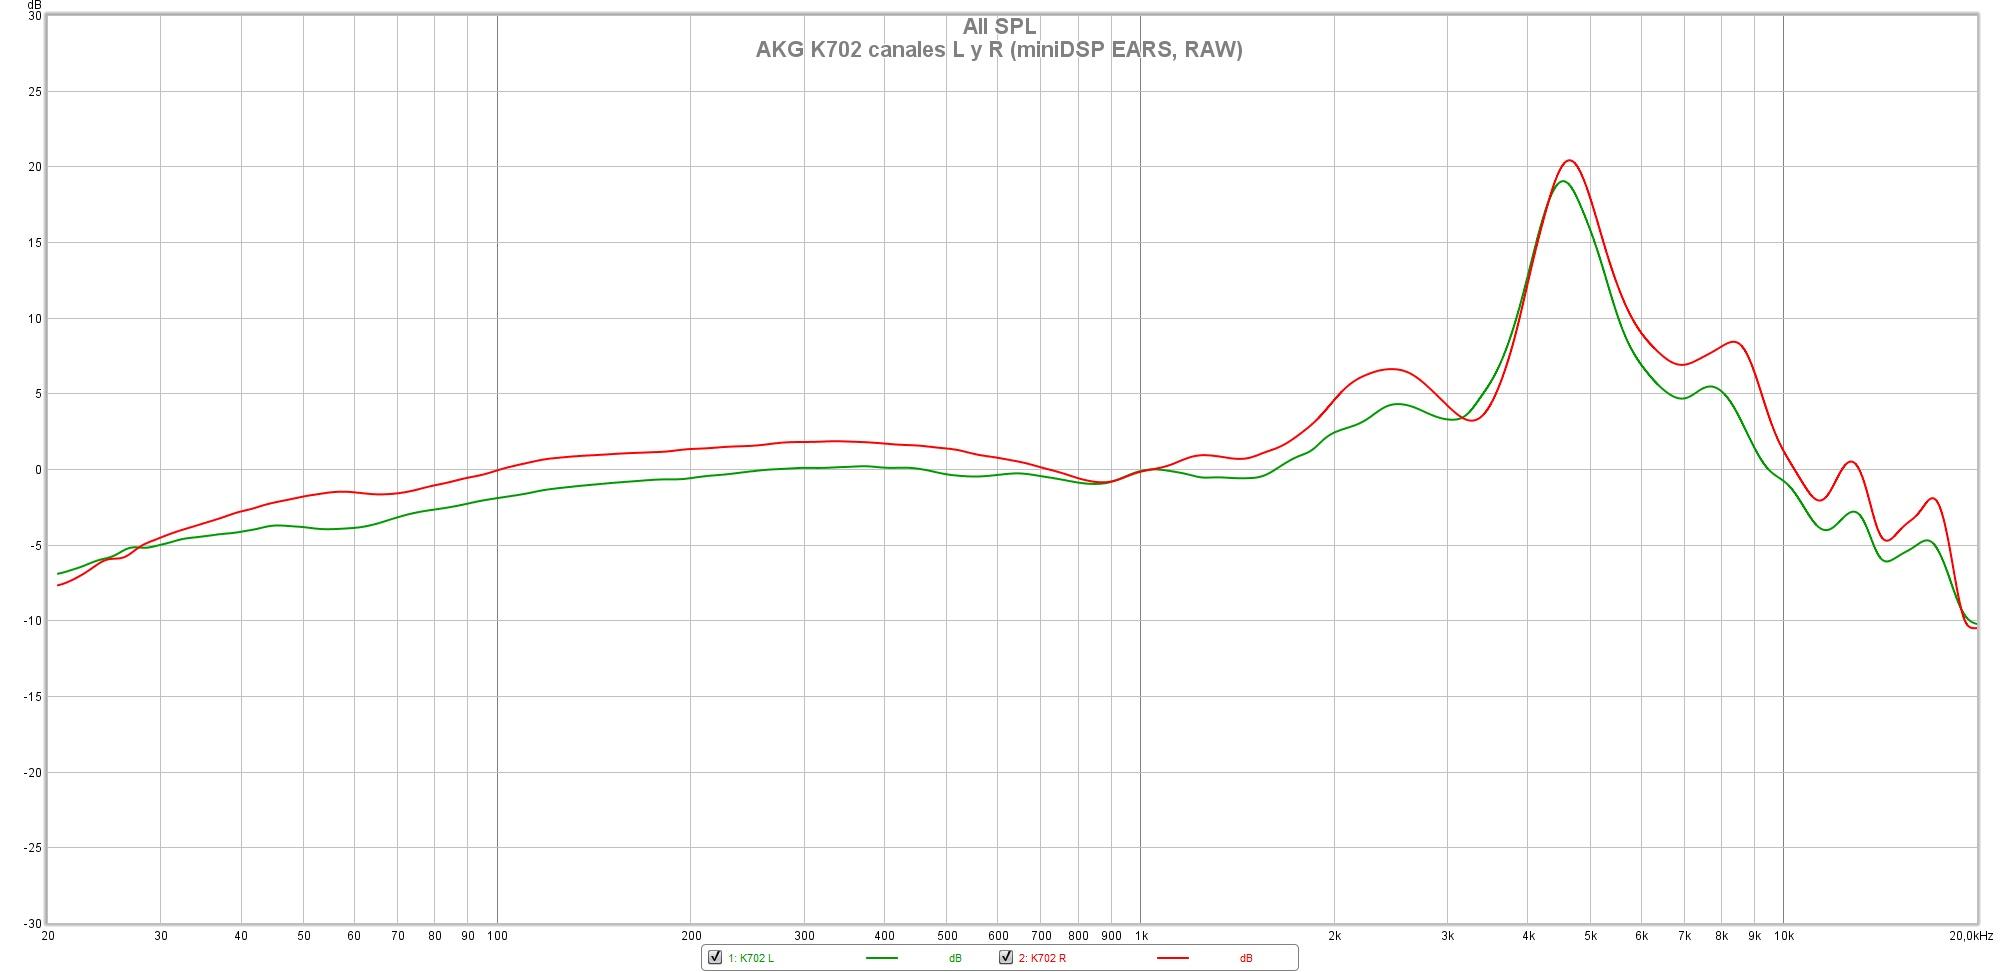 AKG K702 canales L y R (miniDSP EARS, RAW)